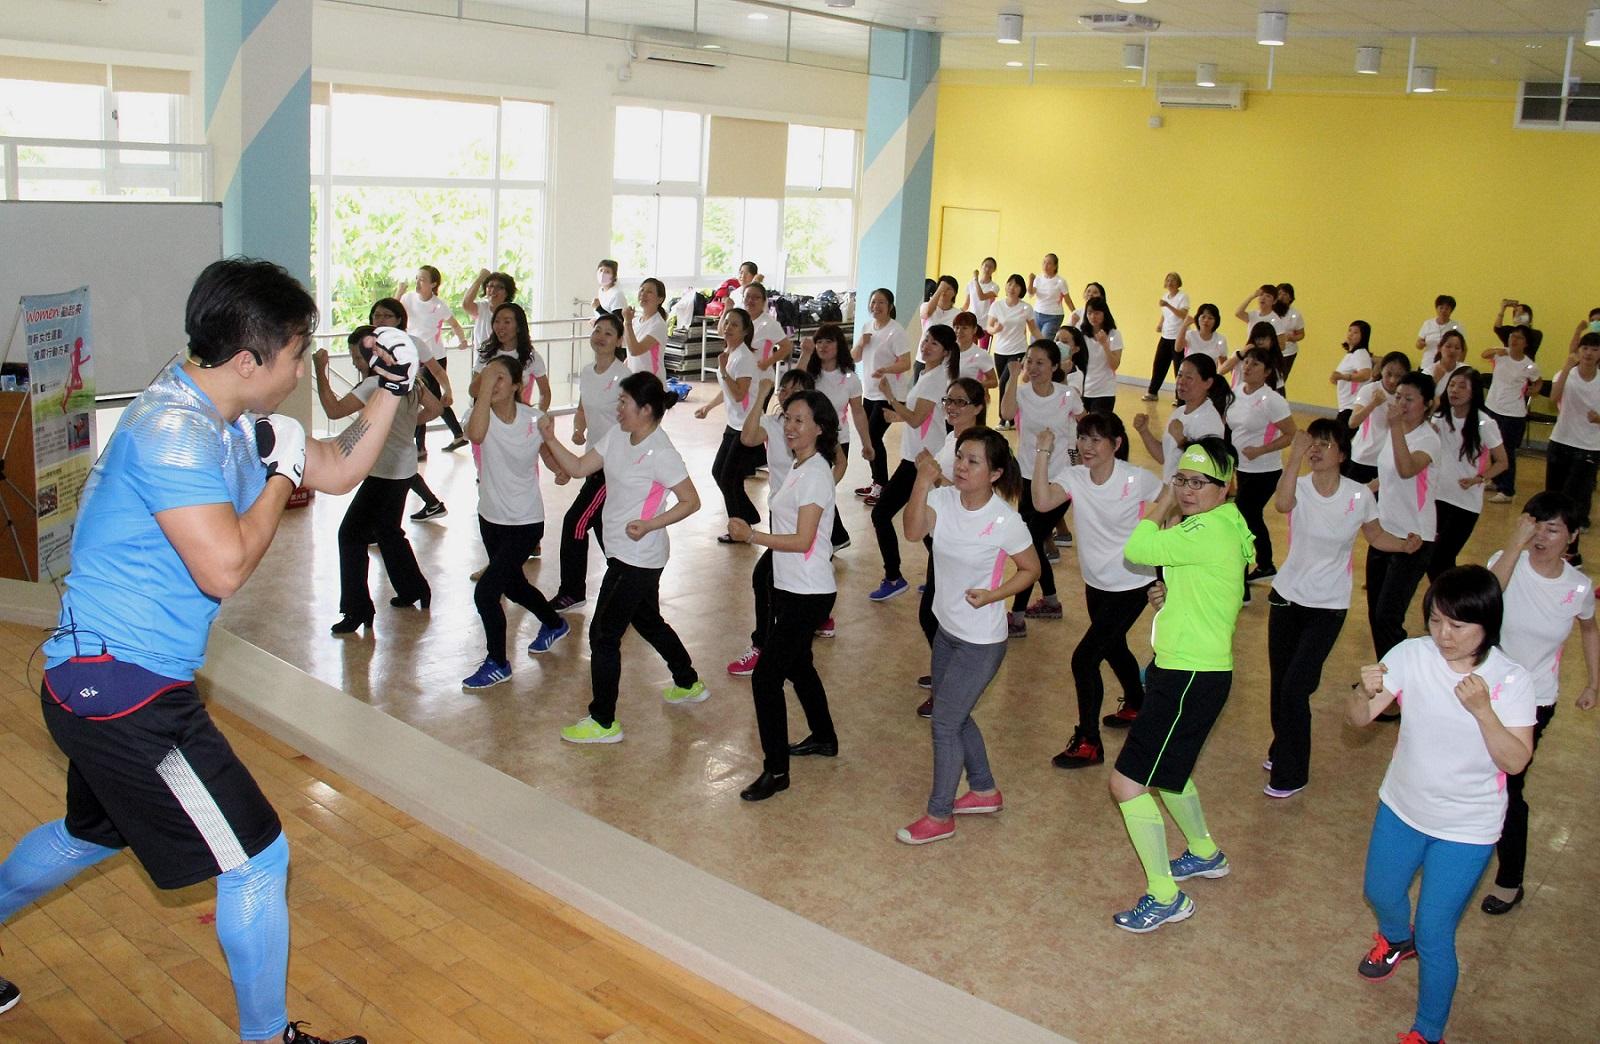 「Women動起來」新女性運動補給站躍動大會,由有氧老師帶領新住民與社區女性朋友們一起體驗拳擊有氧揮灑汗水的快感。(主辦單位提供)